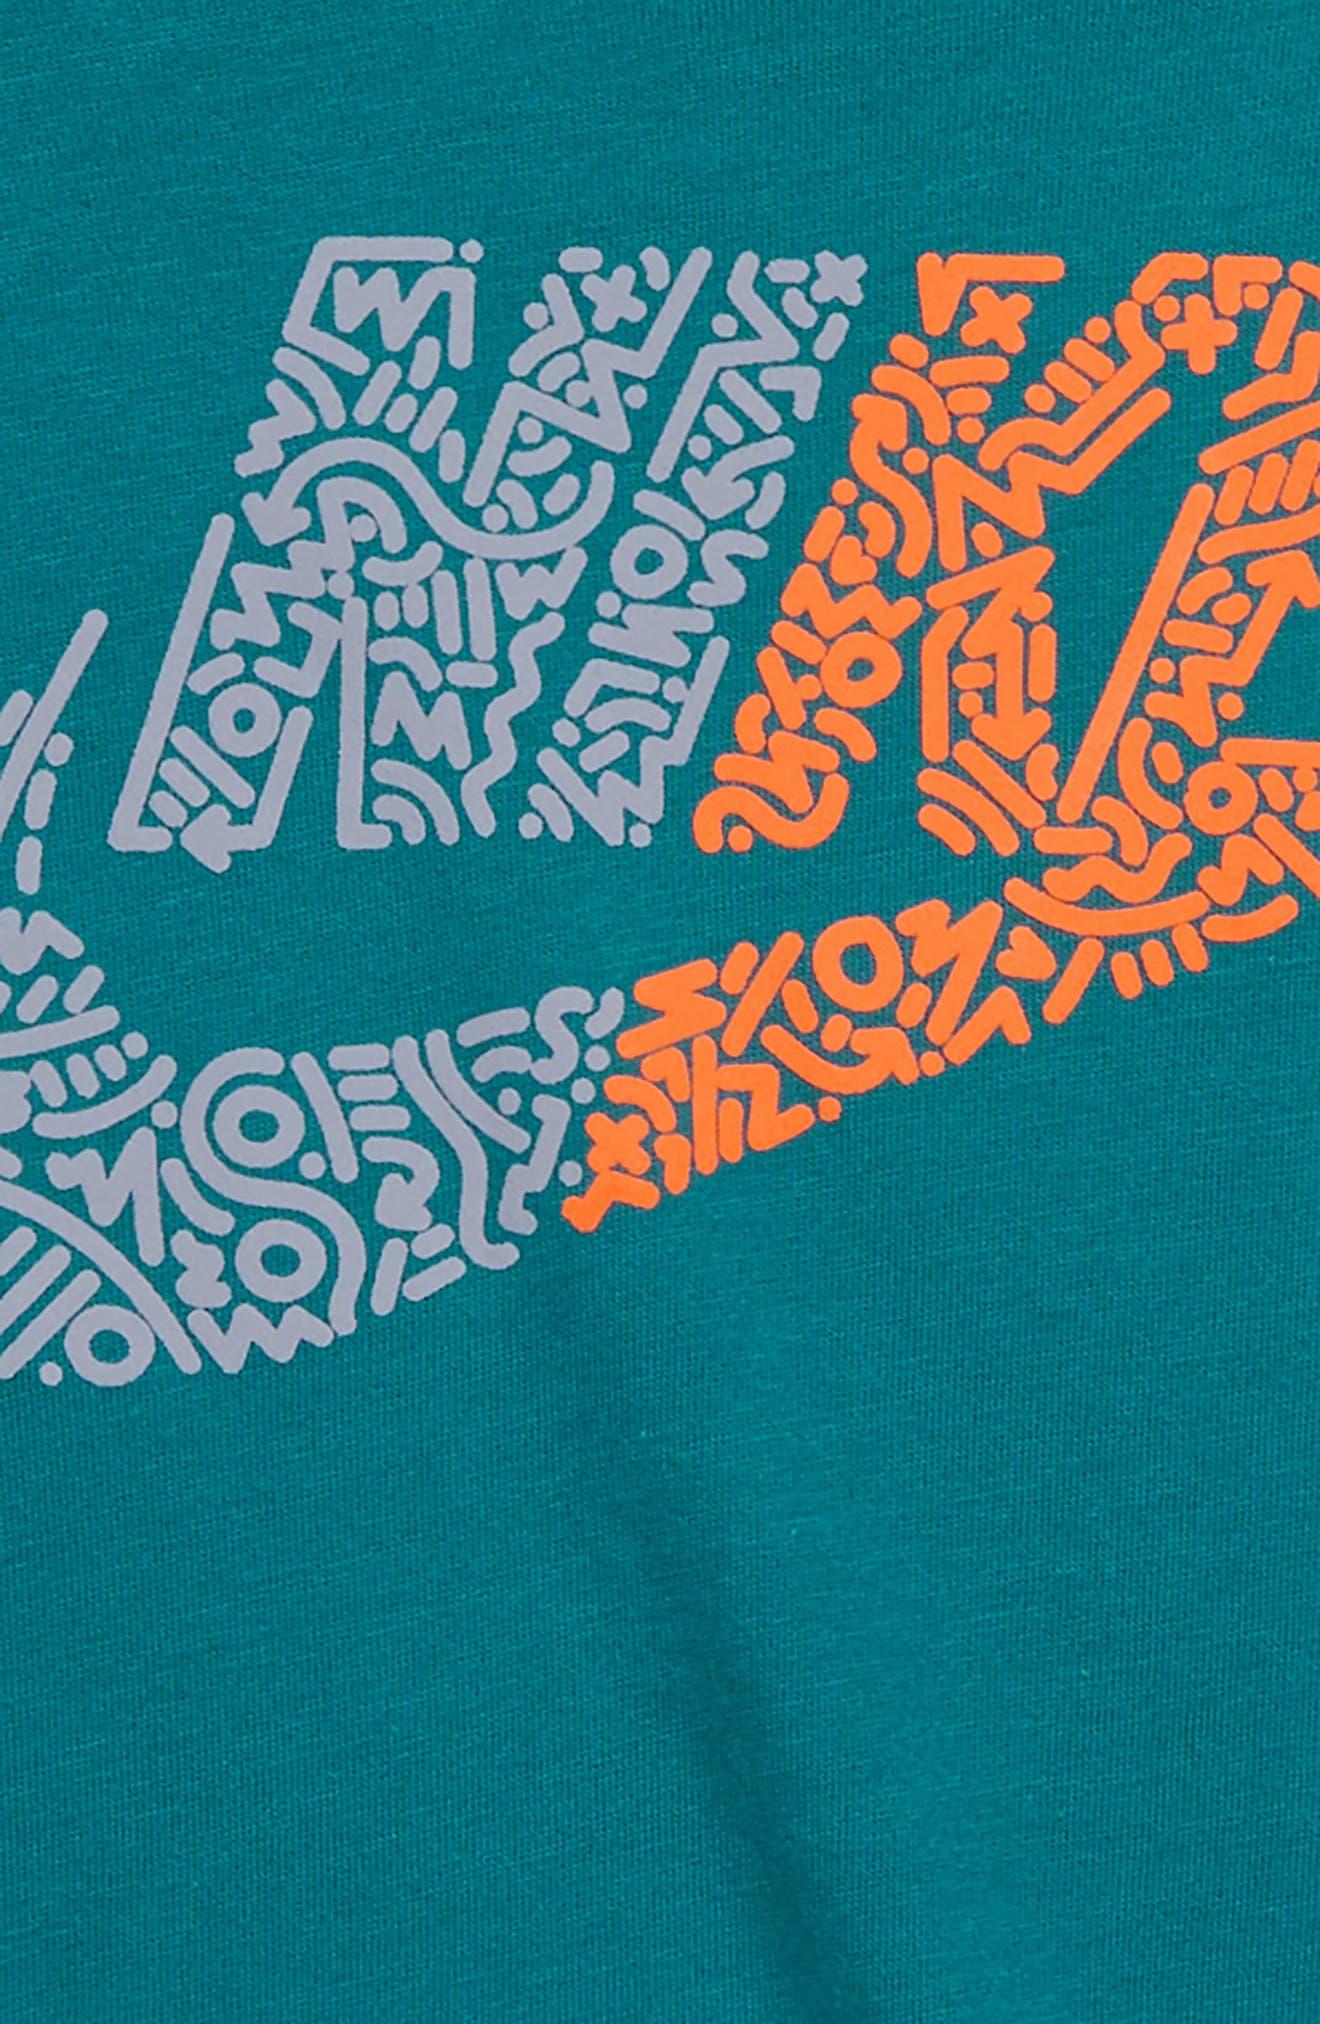 Sportswear Futura T-Shirt,                             Alternate thumbnail 2, color,                             GEODE TEAL/ ASHEN SLATE